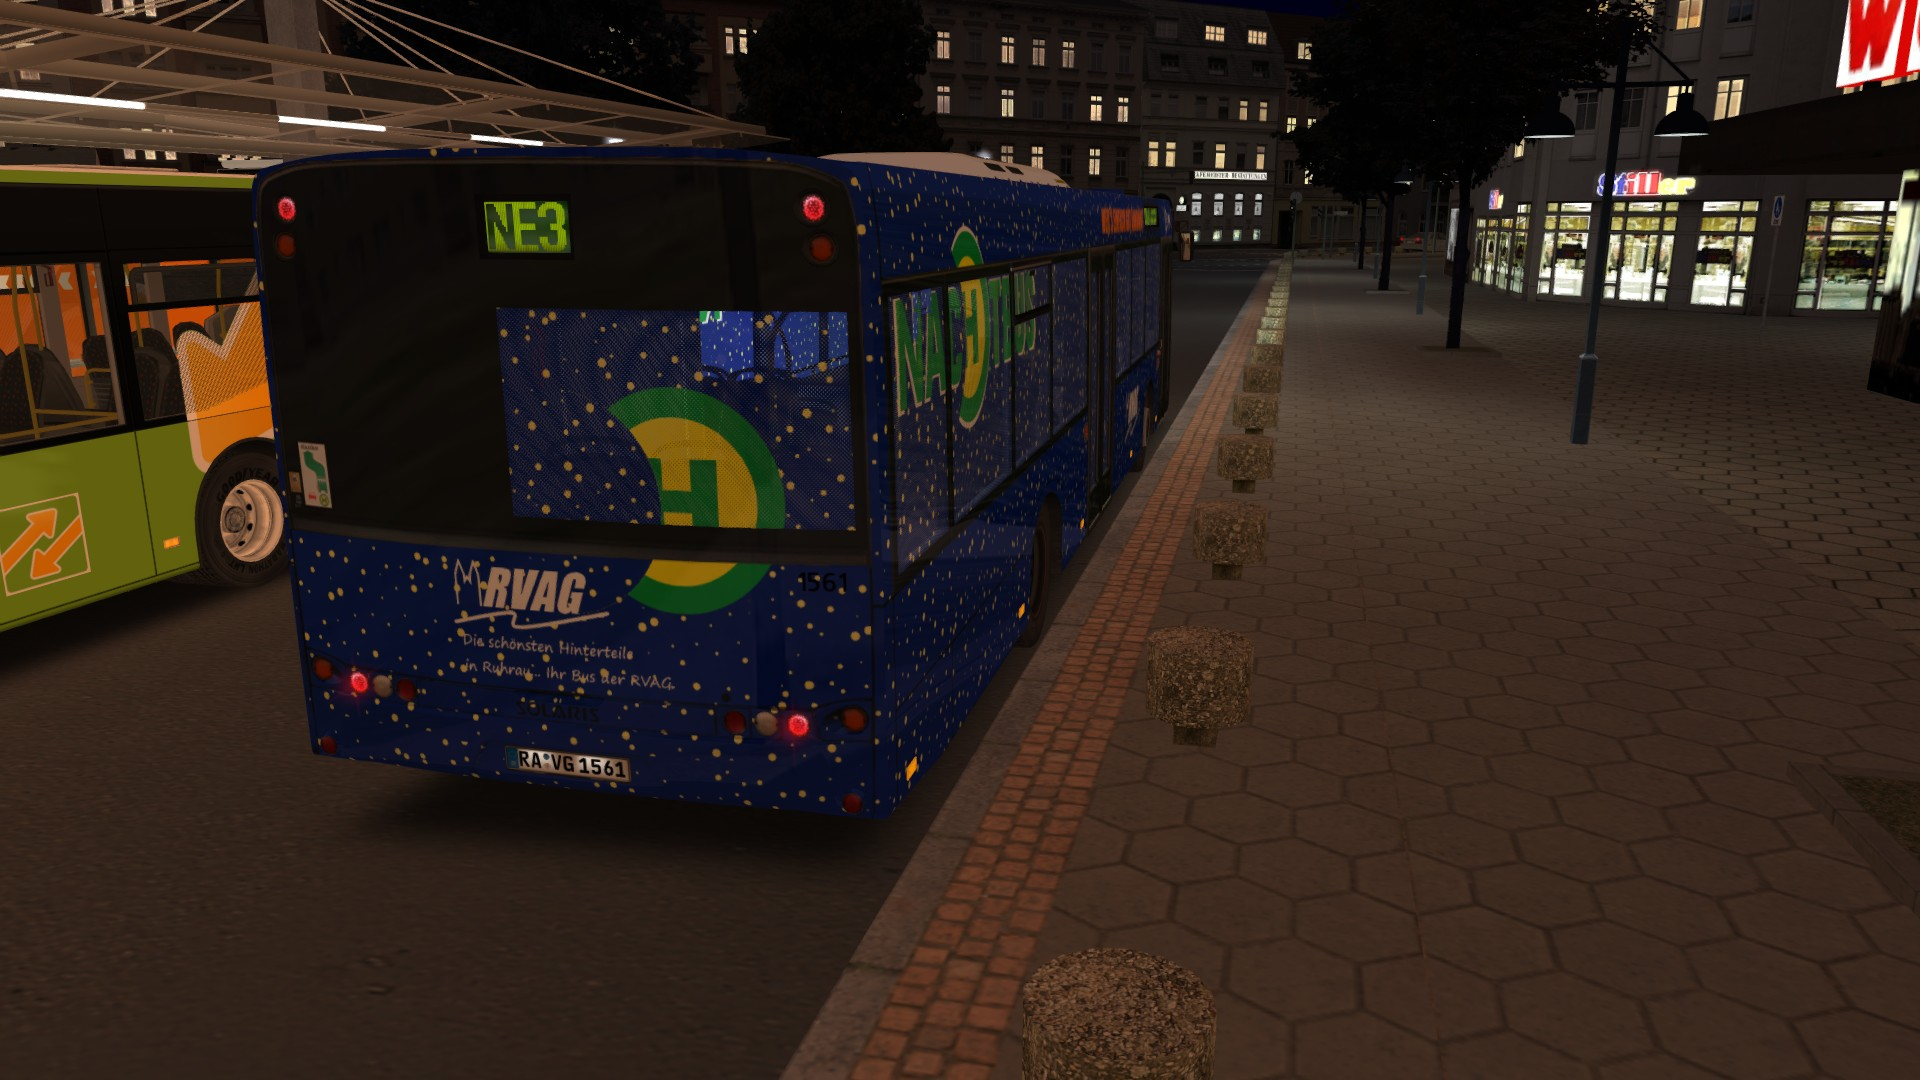 nachtbus01x7kv7.jpg